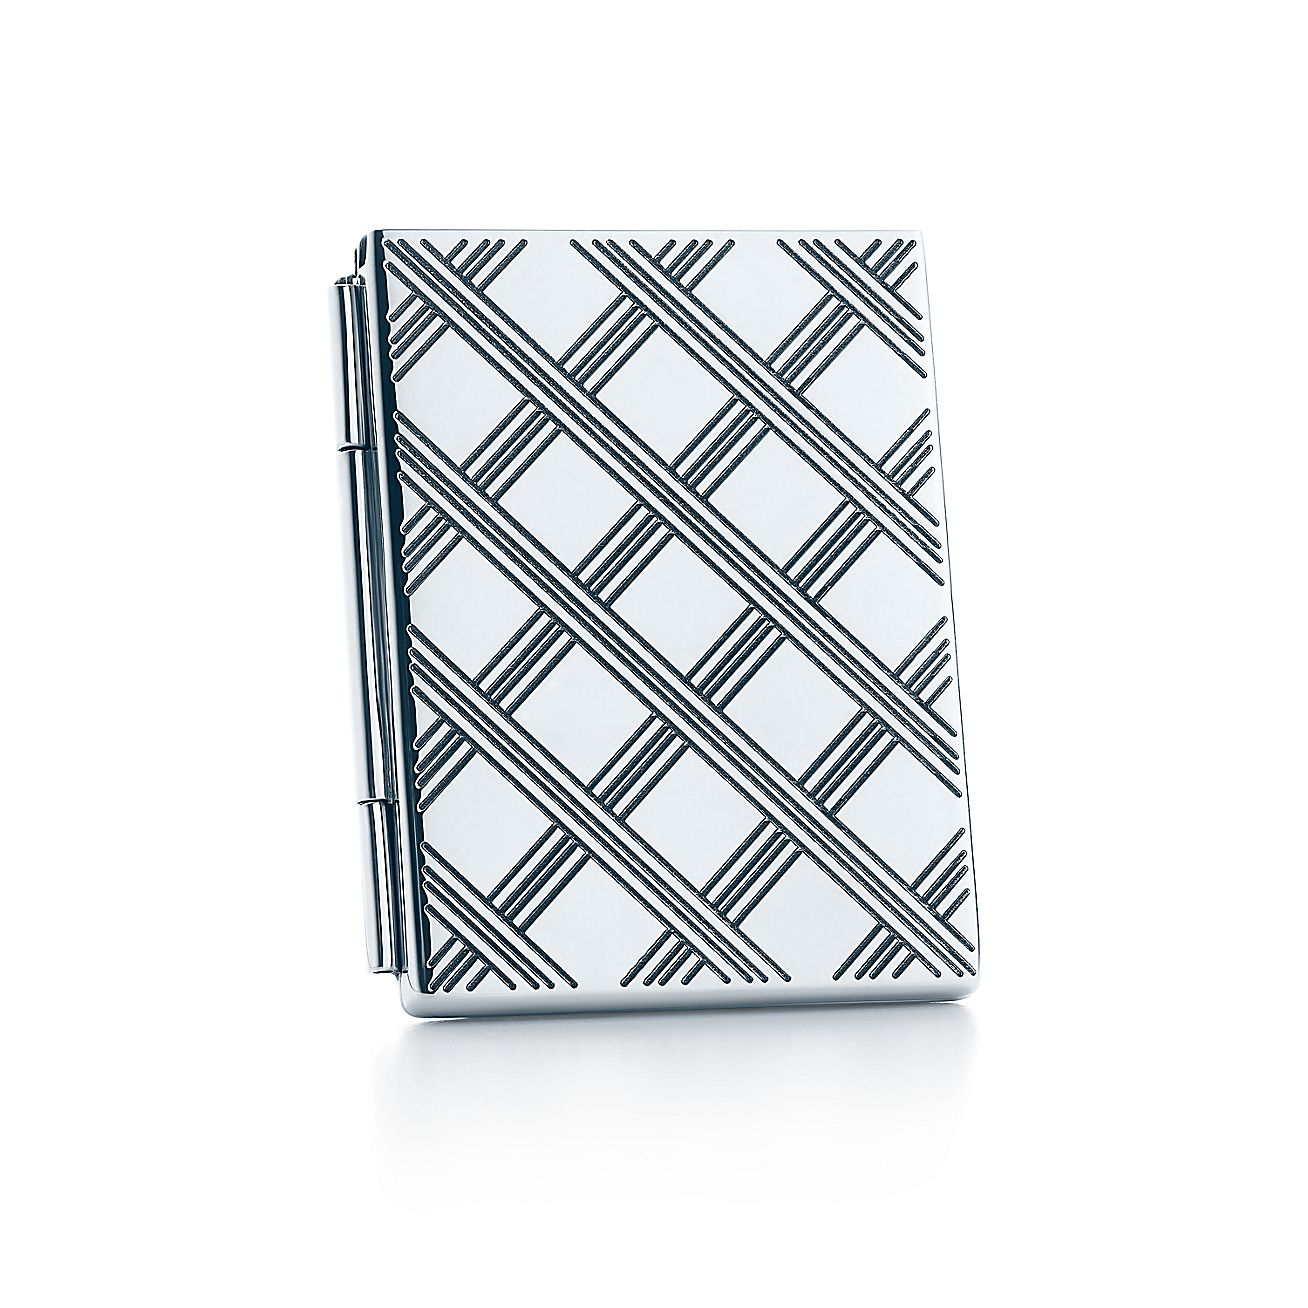 Paloma Picasso®:Villa Paloma Trellis<br>Double Folding Frame